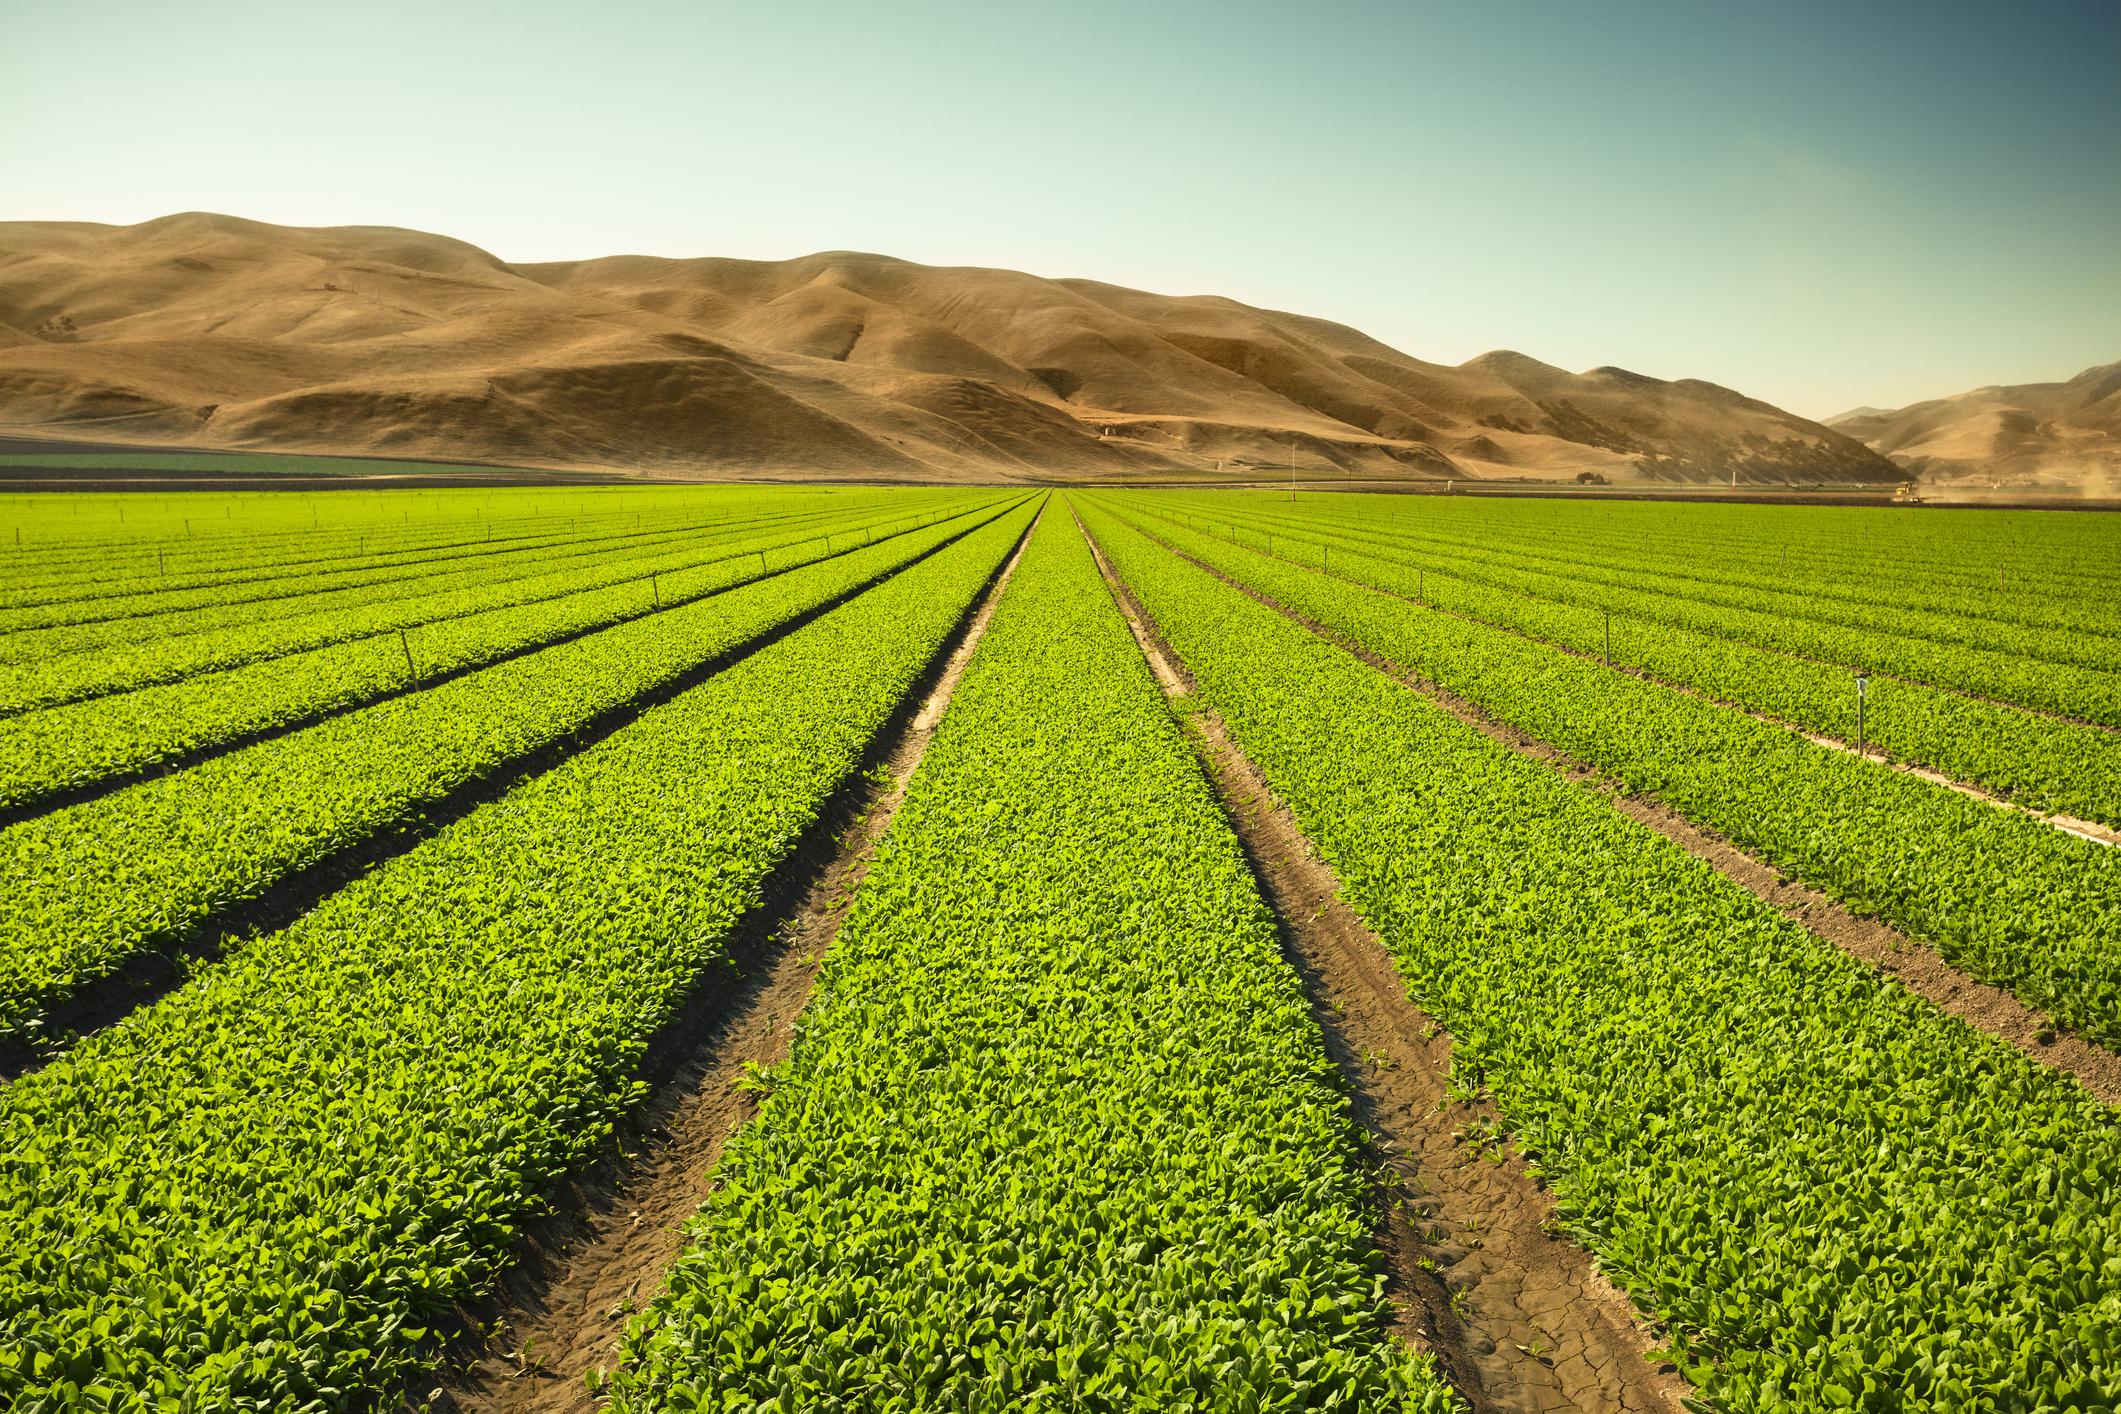 """A green row celery field in the Salinas Valley, California USA"""